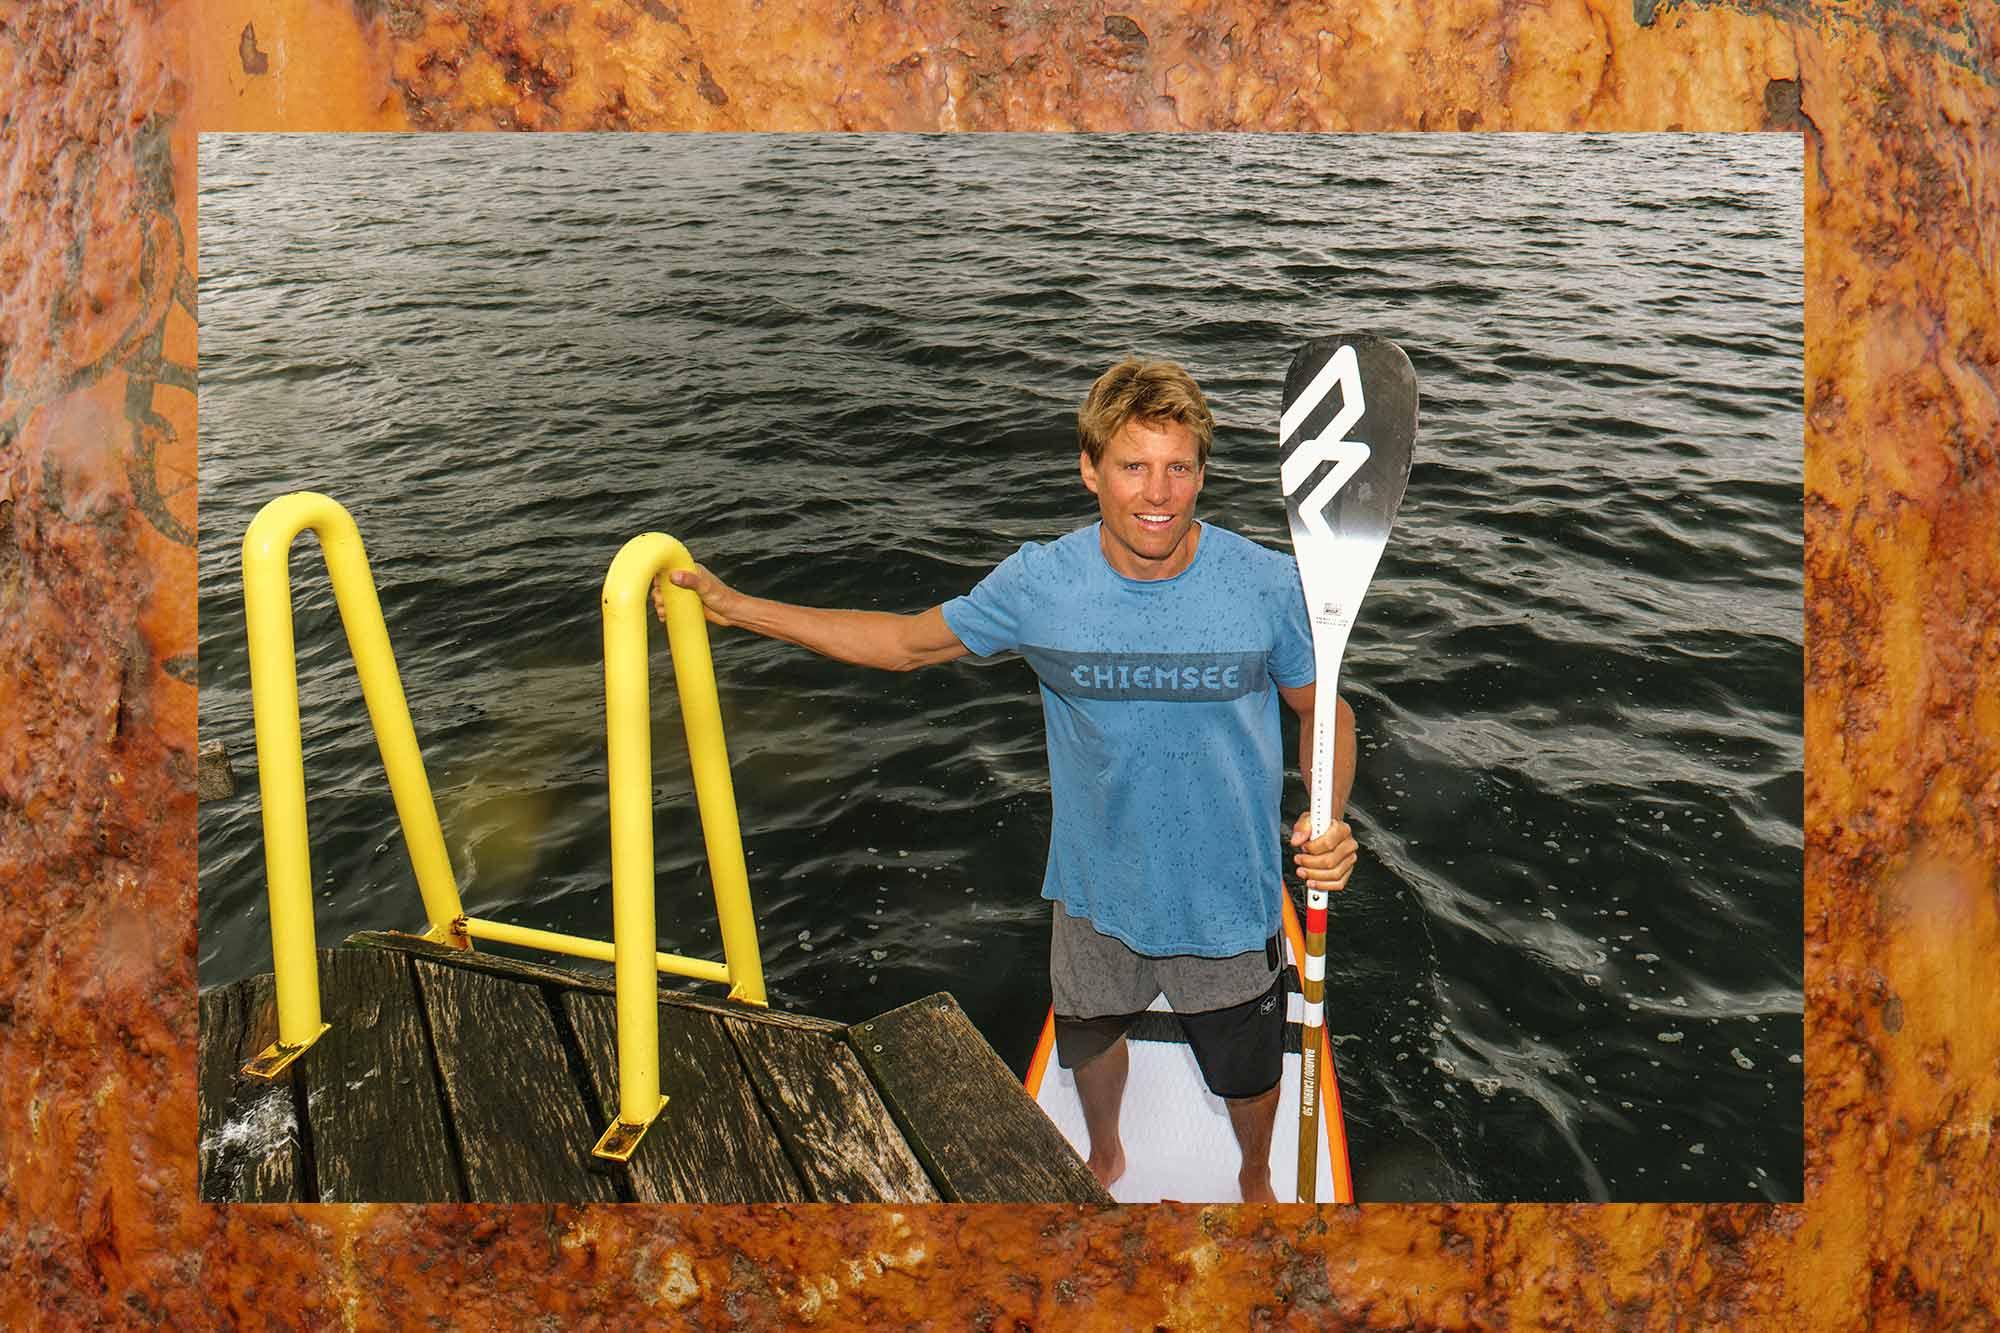 10-klaas-voget-profi-windsurfer